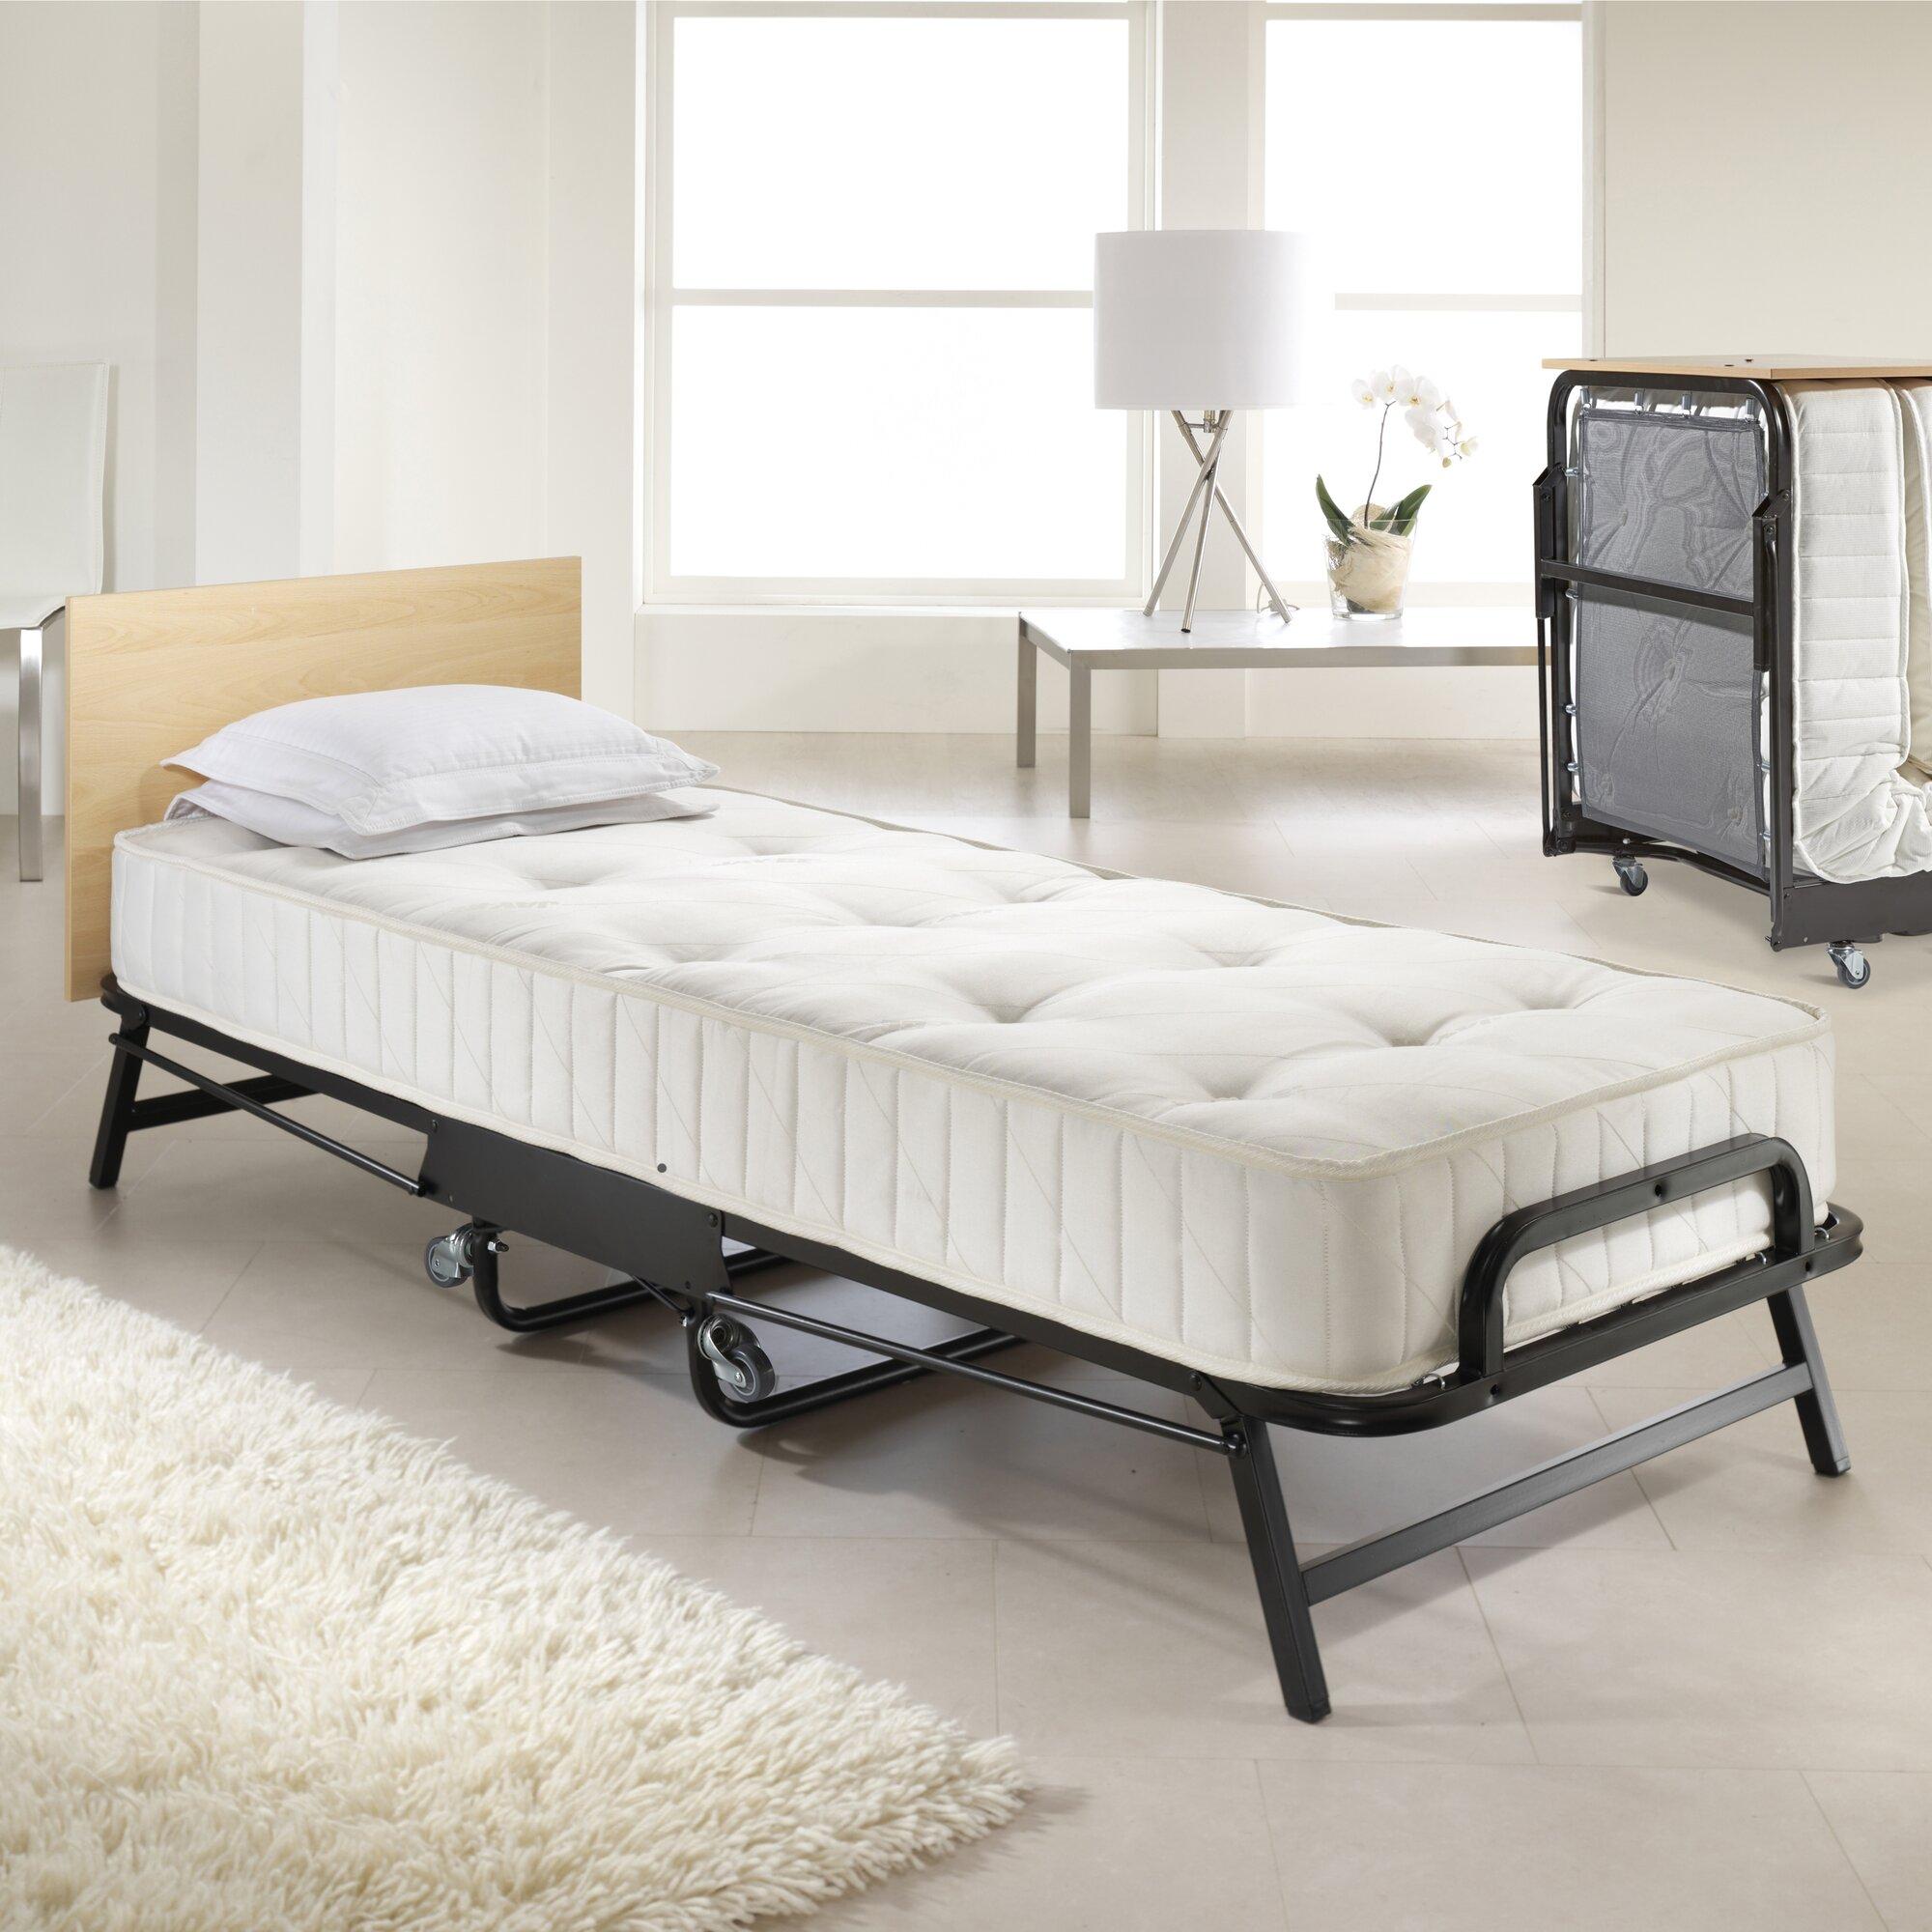 Folding Beds Reviews : Jay be crown premier folding bed reviews wayfair